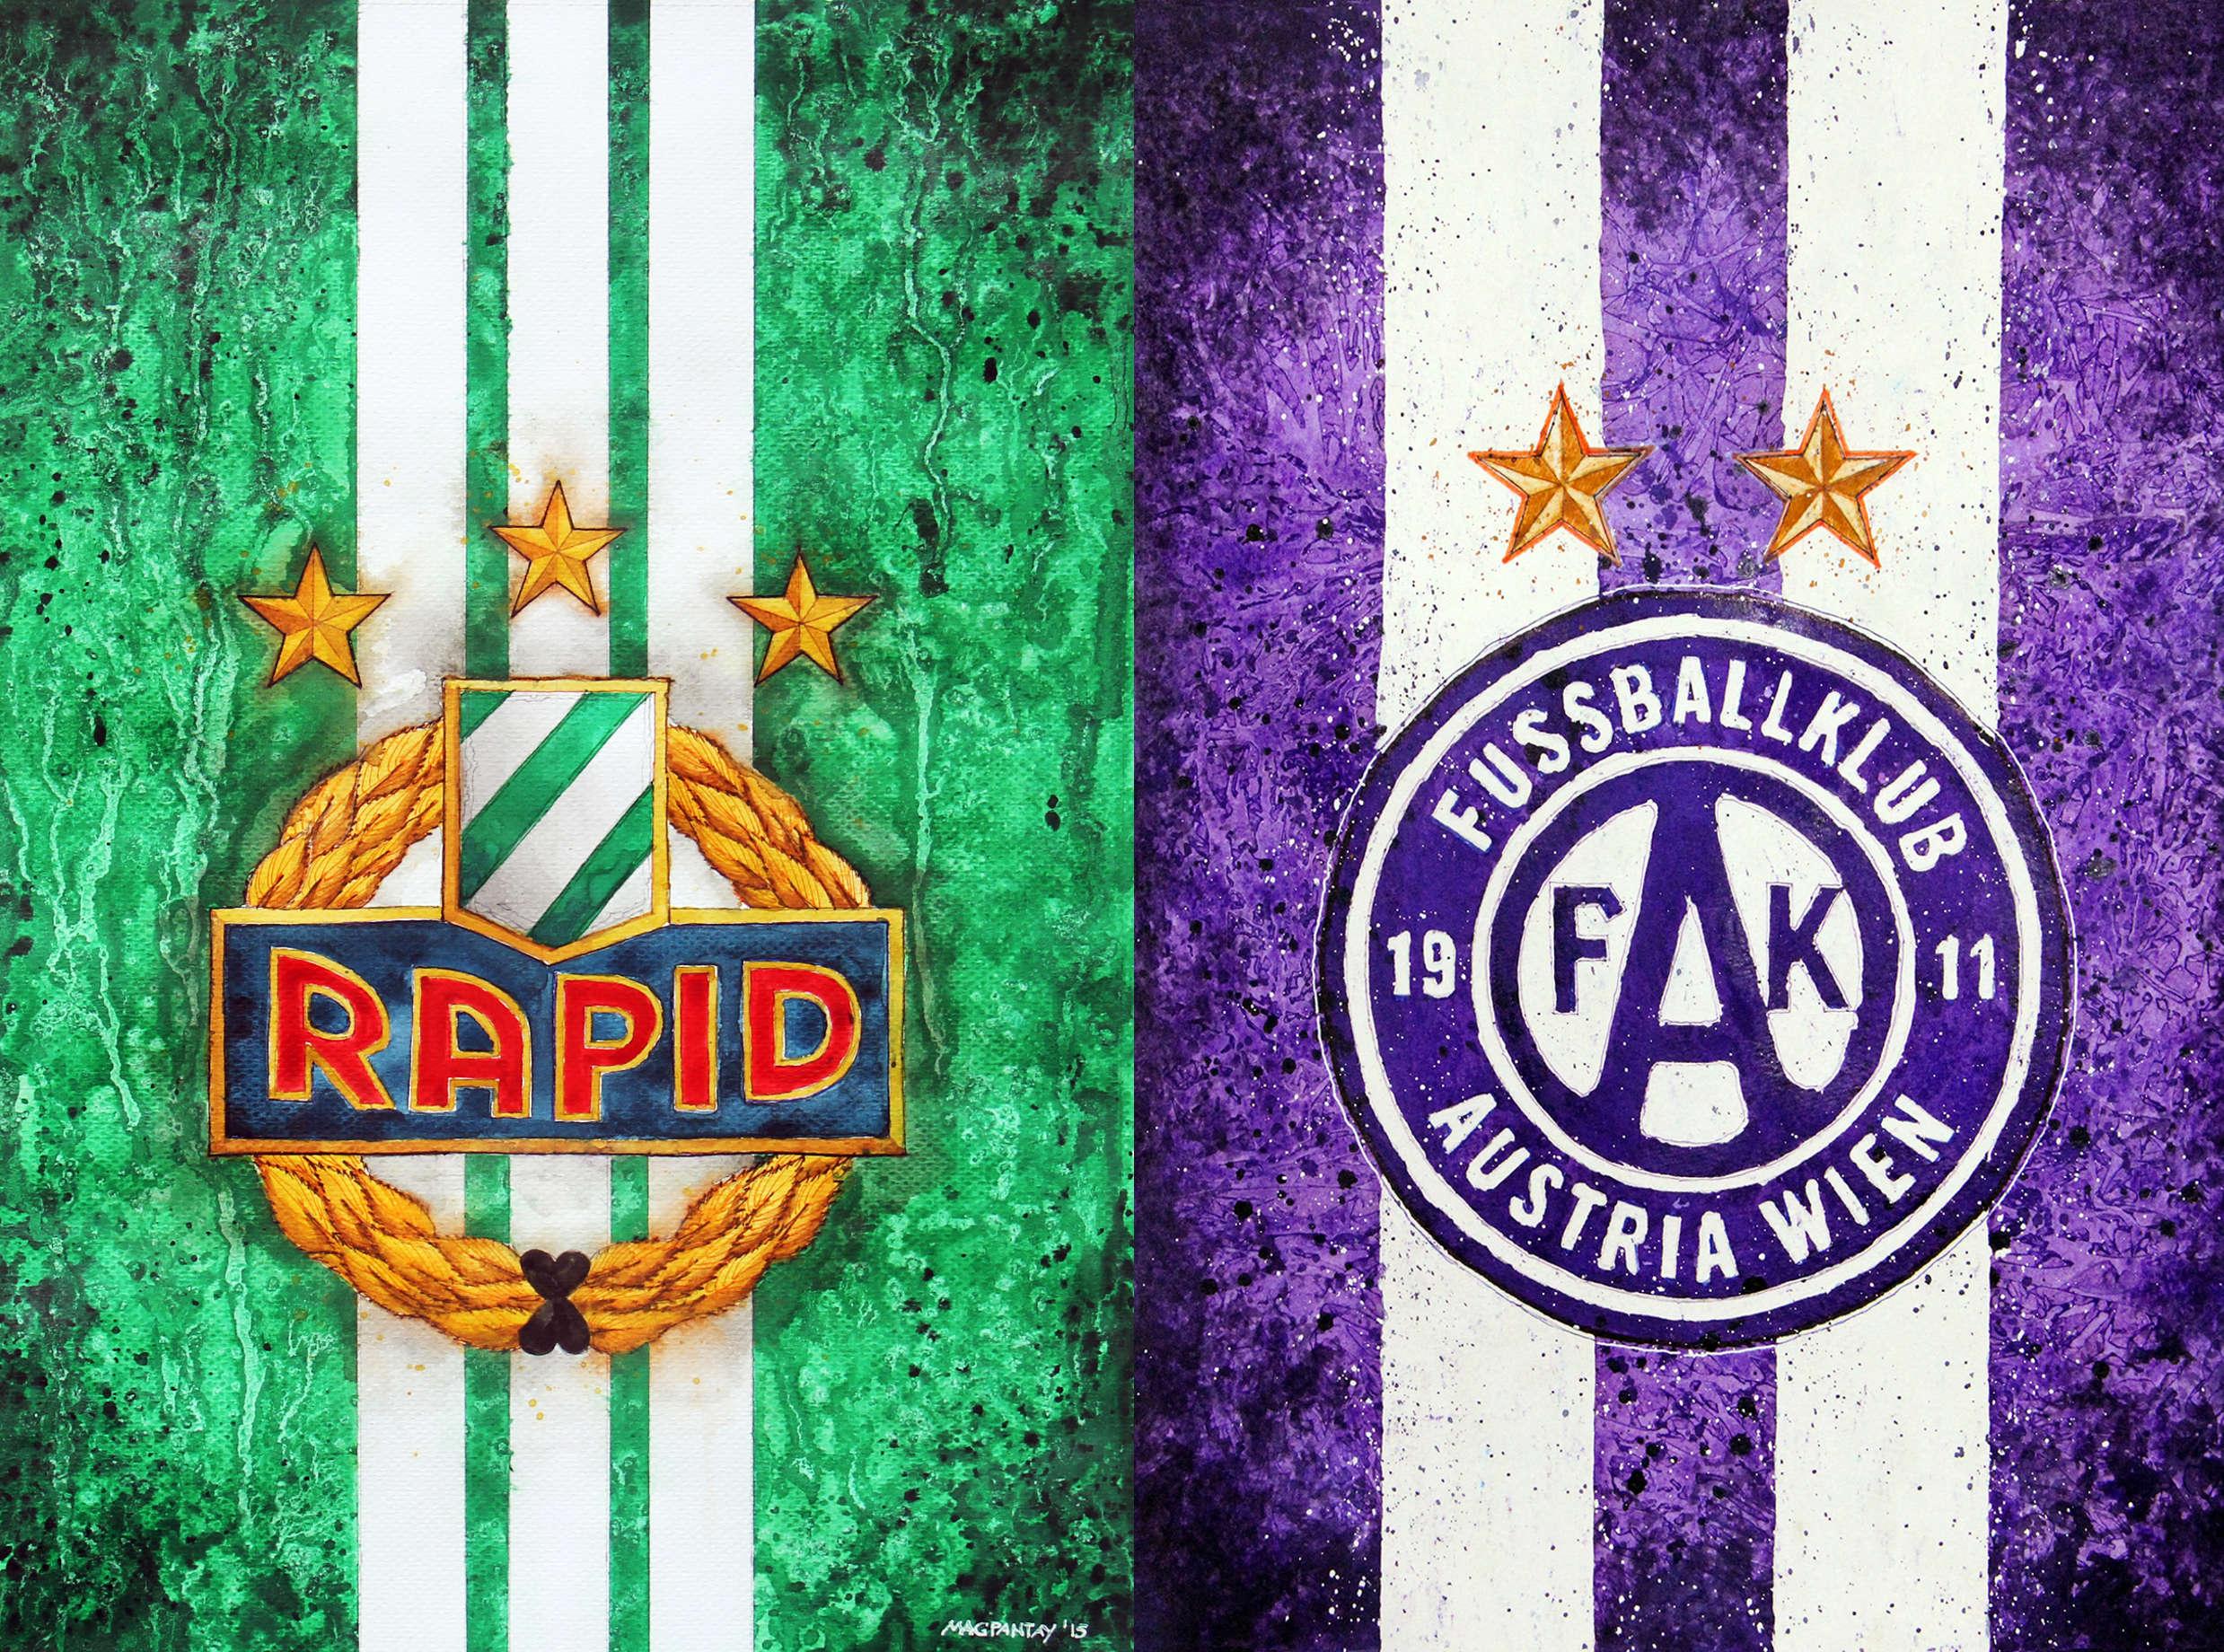 Rapid Austria Wiener Derby